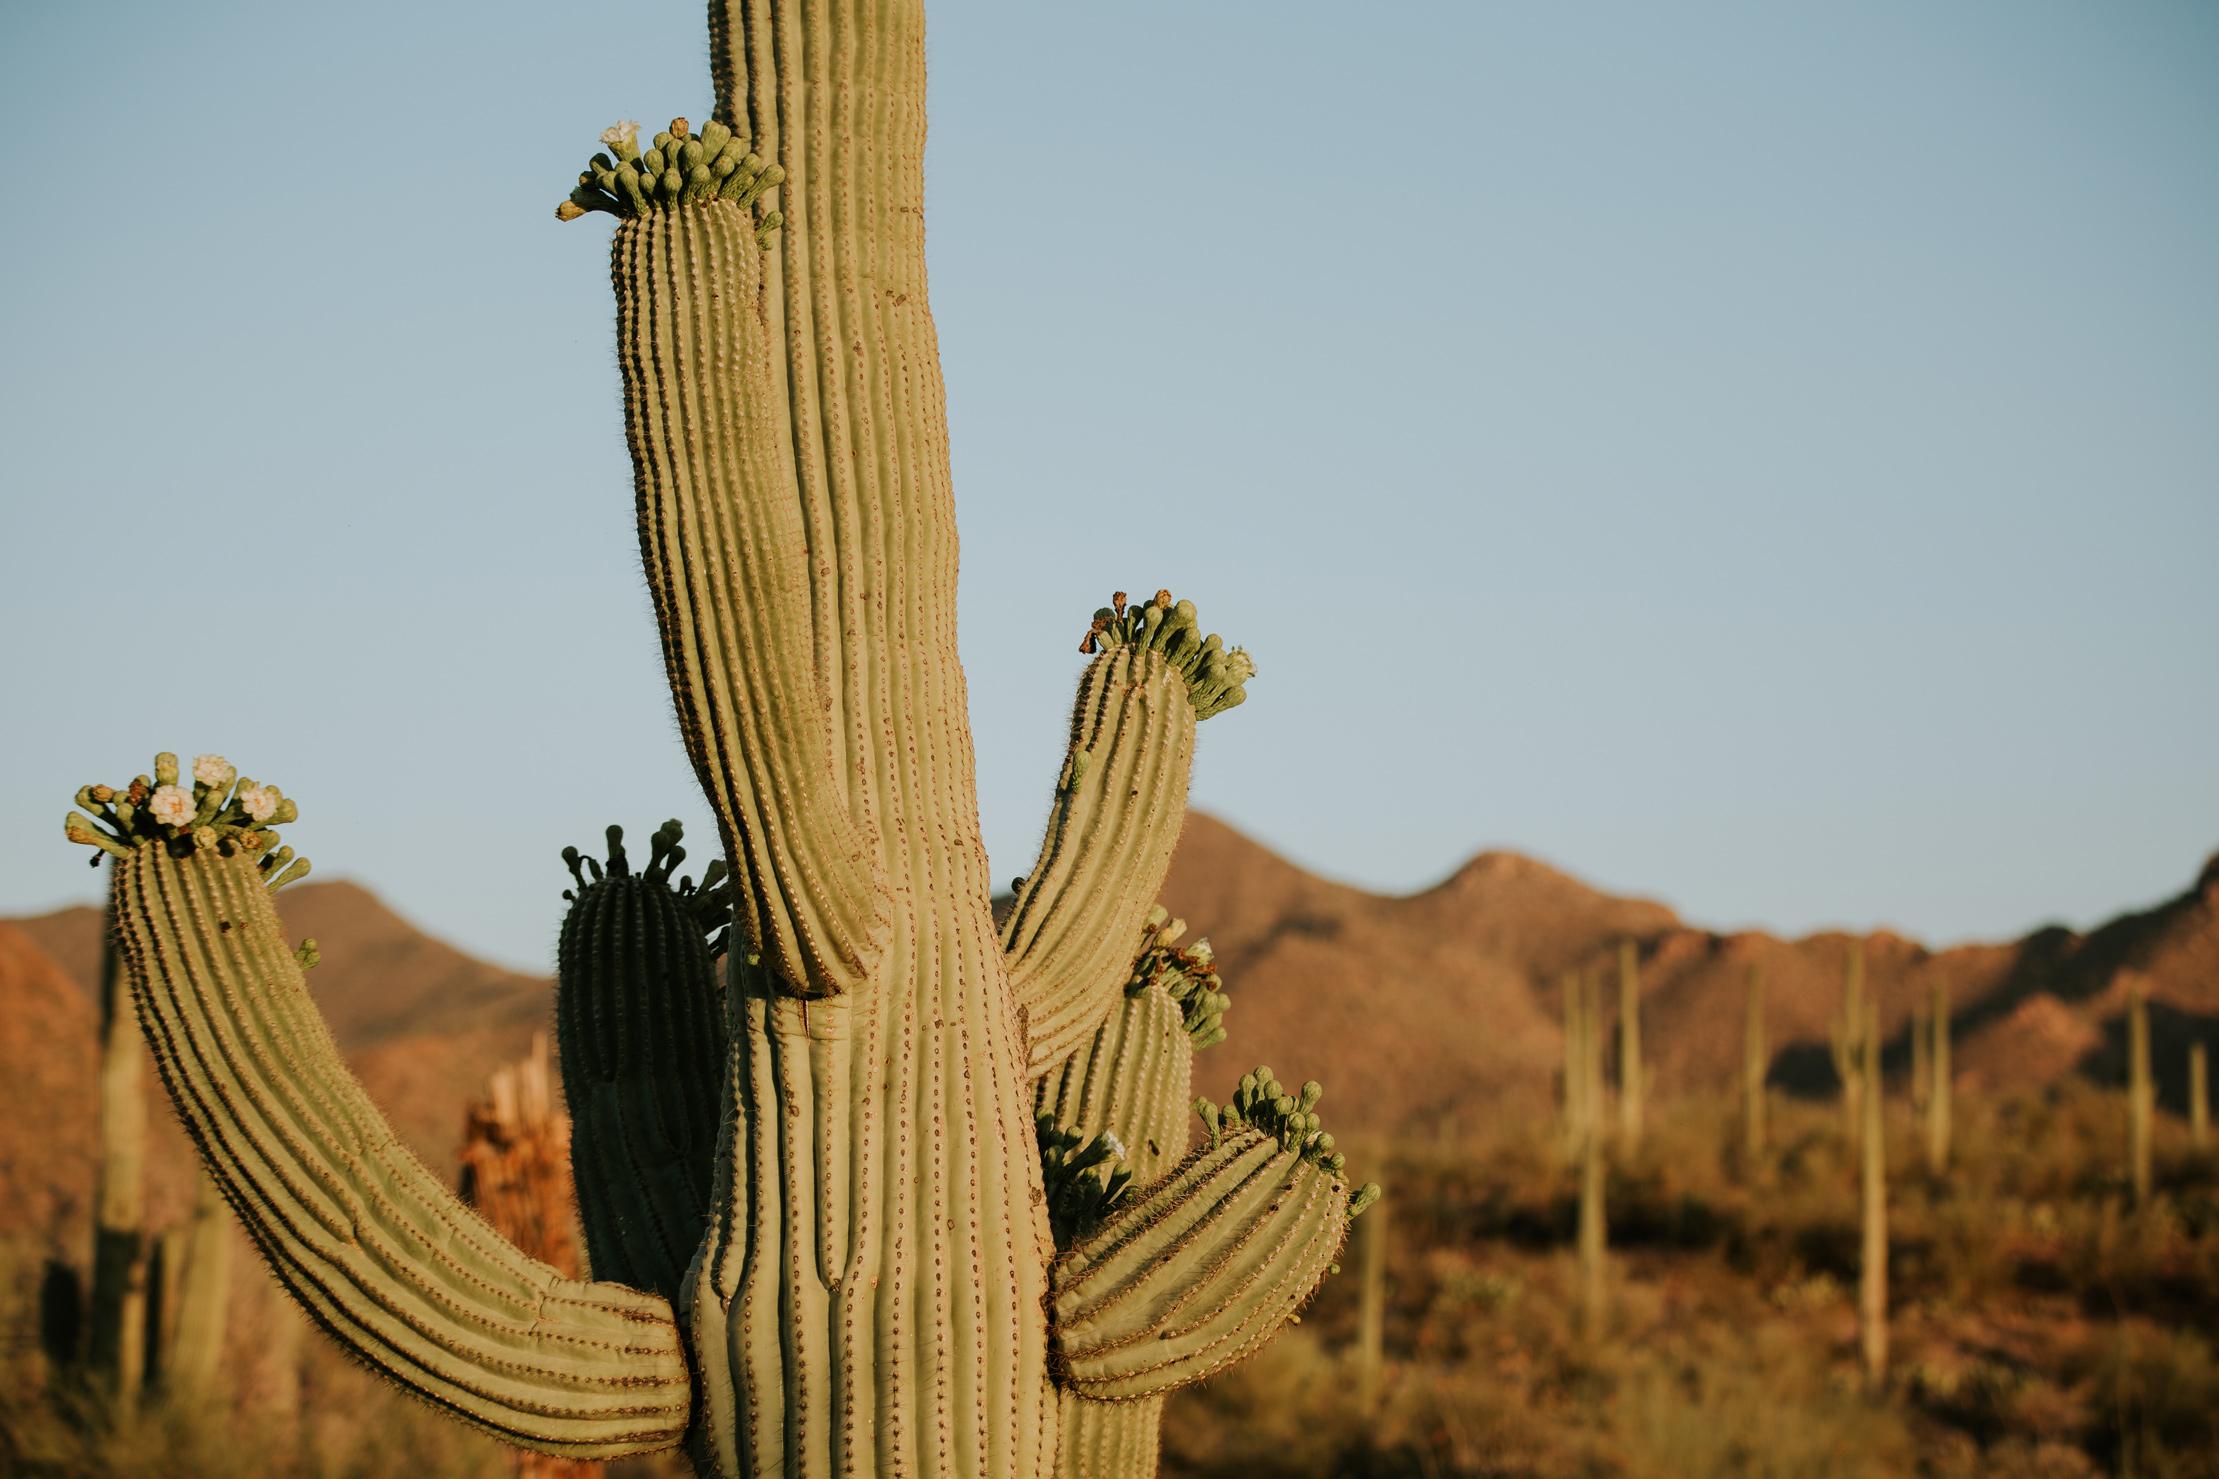 CindyGiovagnoli_Tucson_Arizona_Saguaro_National_Park_cactus_sunset_blooming_spring_sunset_petroglyphs_Native_American_indigenous-006.jpg